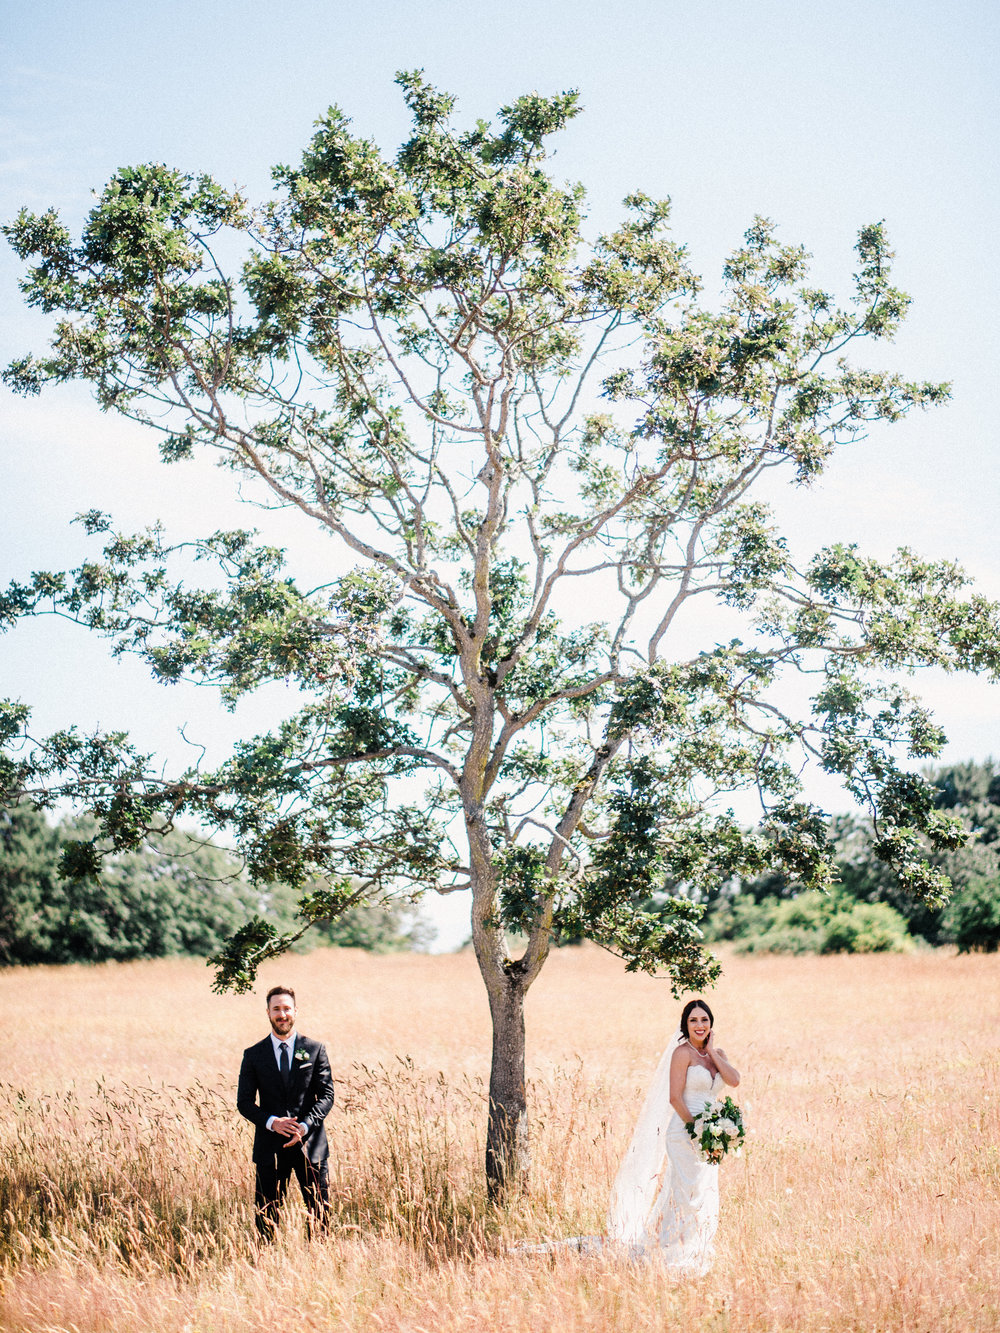 hatley-castle-empress-hotel-victoria-bc-wedding-ryan-flynn-photography-tl-portraits-0191.JPG